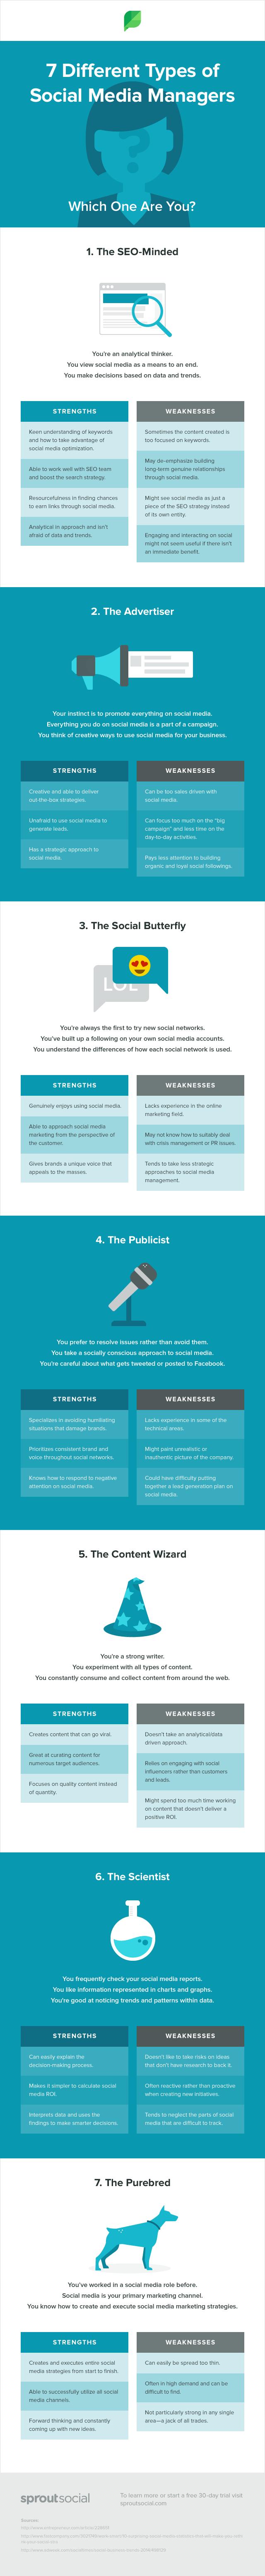 7 tipos de Social Media Manager